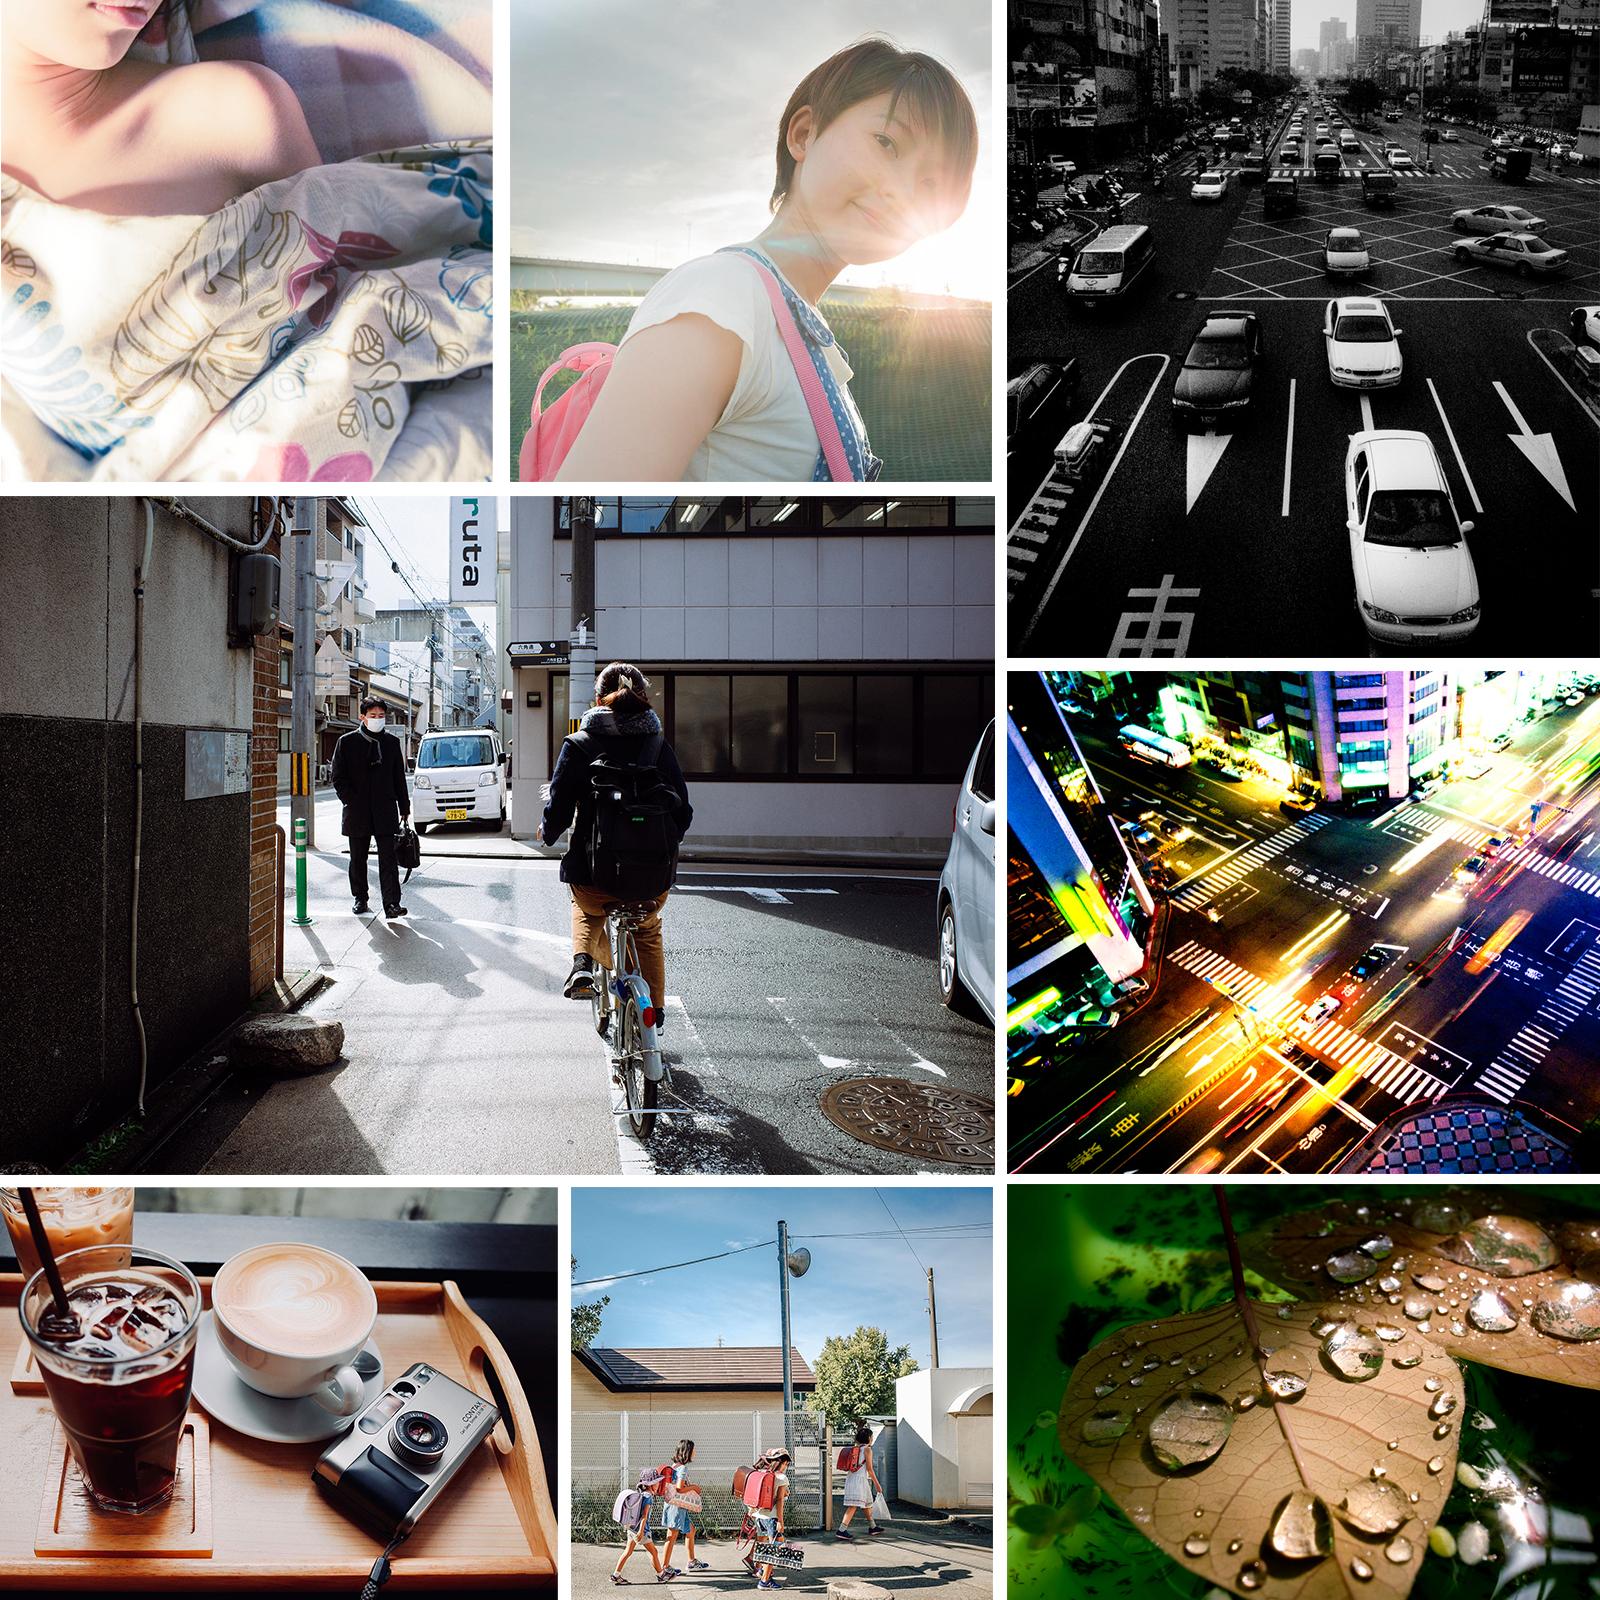 Ricoh GR 輕便相機的攝影美學,填問卷抽課程。